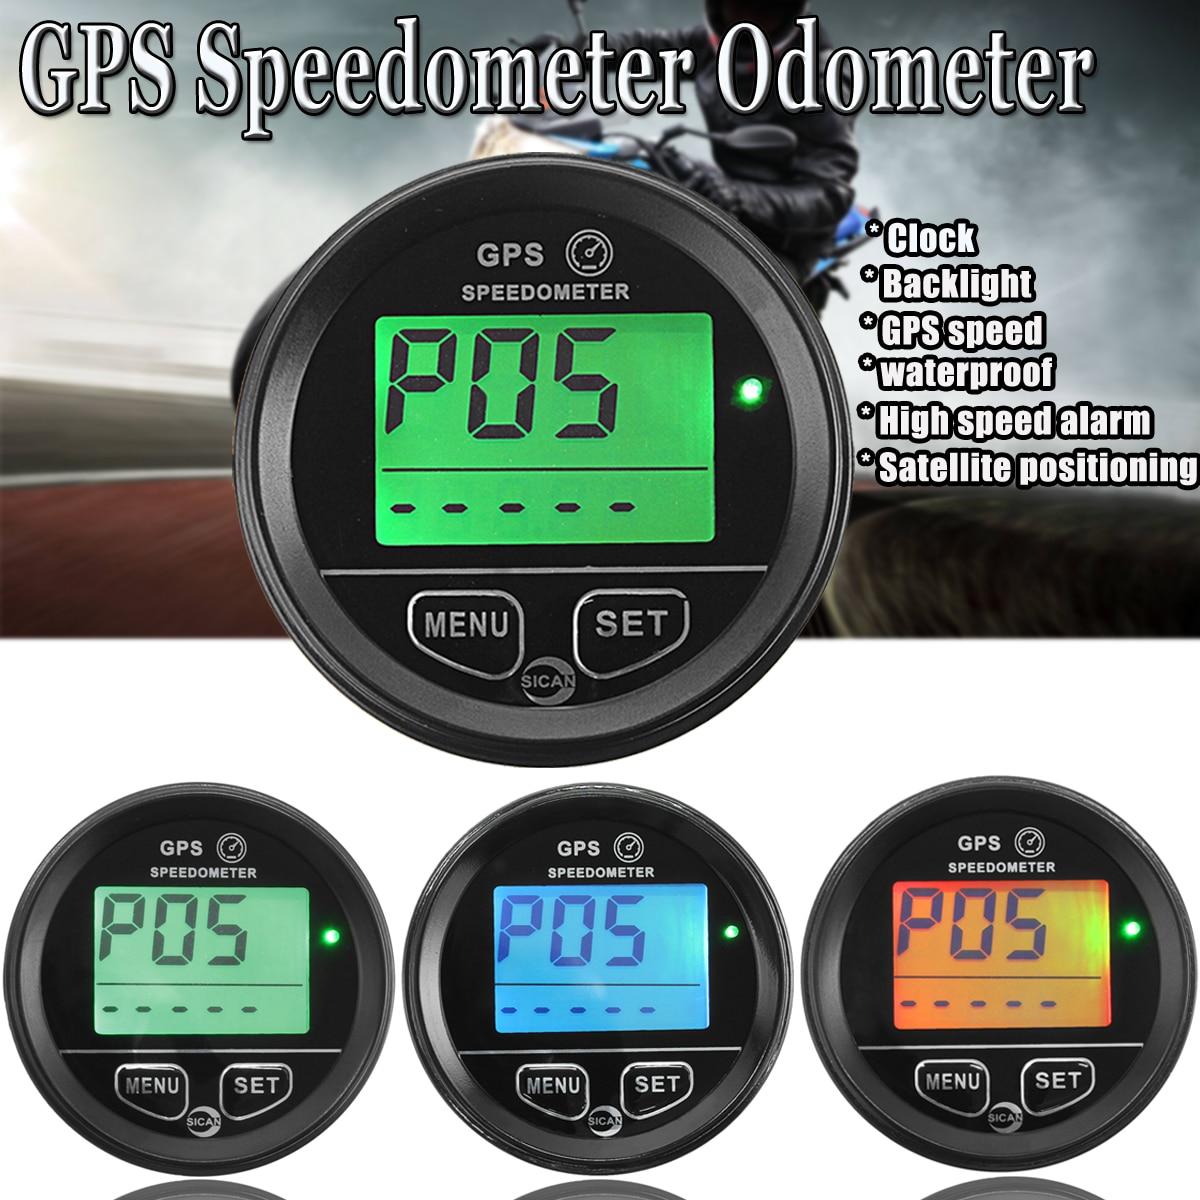 60mm Motorcycle GPS Speedometer Odometer for Motorcycle Atv Marine Boat Buggy Golf Go Cart Truck black 60mm gps digital speedometer 12v 24v odometer gauge car motorcycle atv marine boat truck